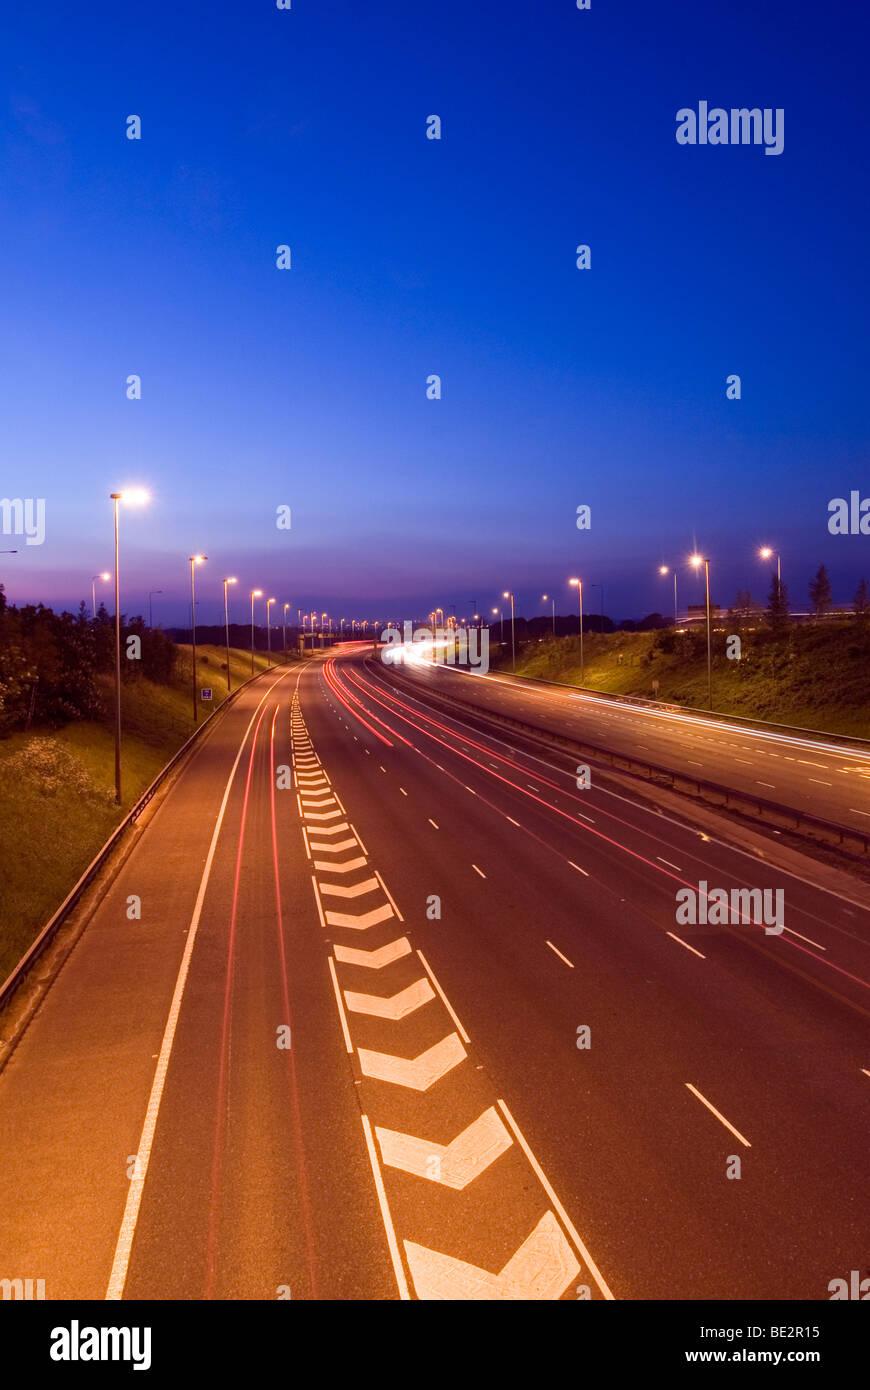 White chevron road markings on M6 motorway north, Thelwall Viaduct, Warrington, Cheshire Stock Photo